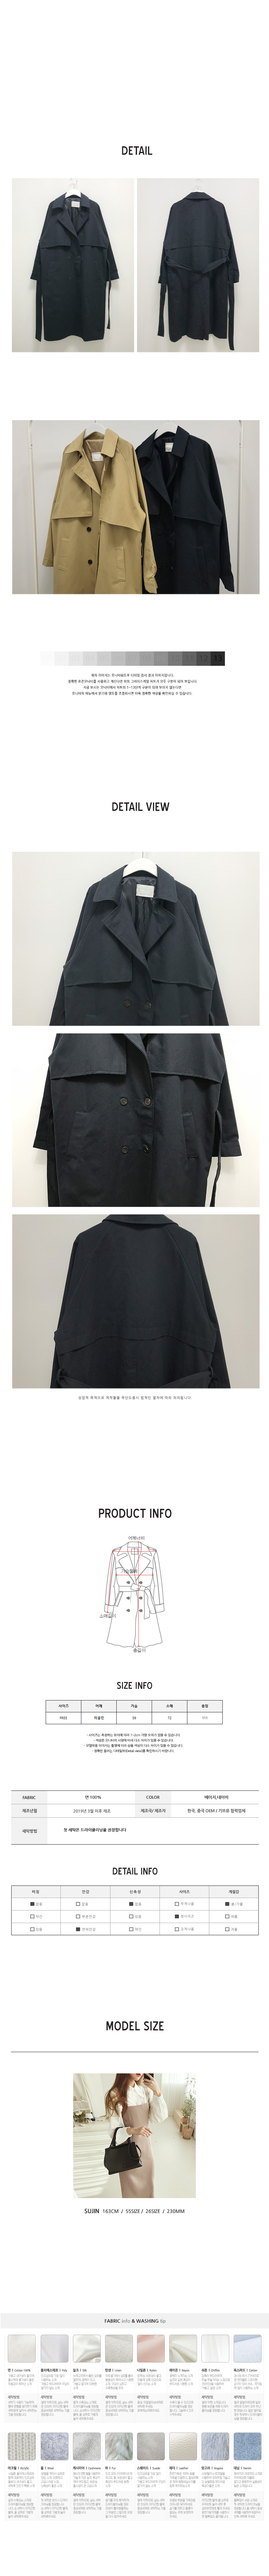 Kale Trench Coat